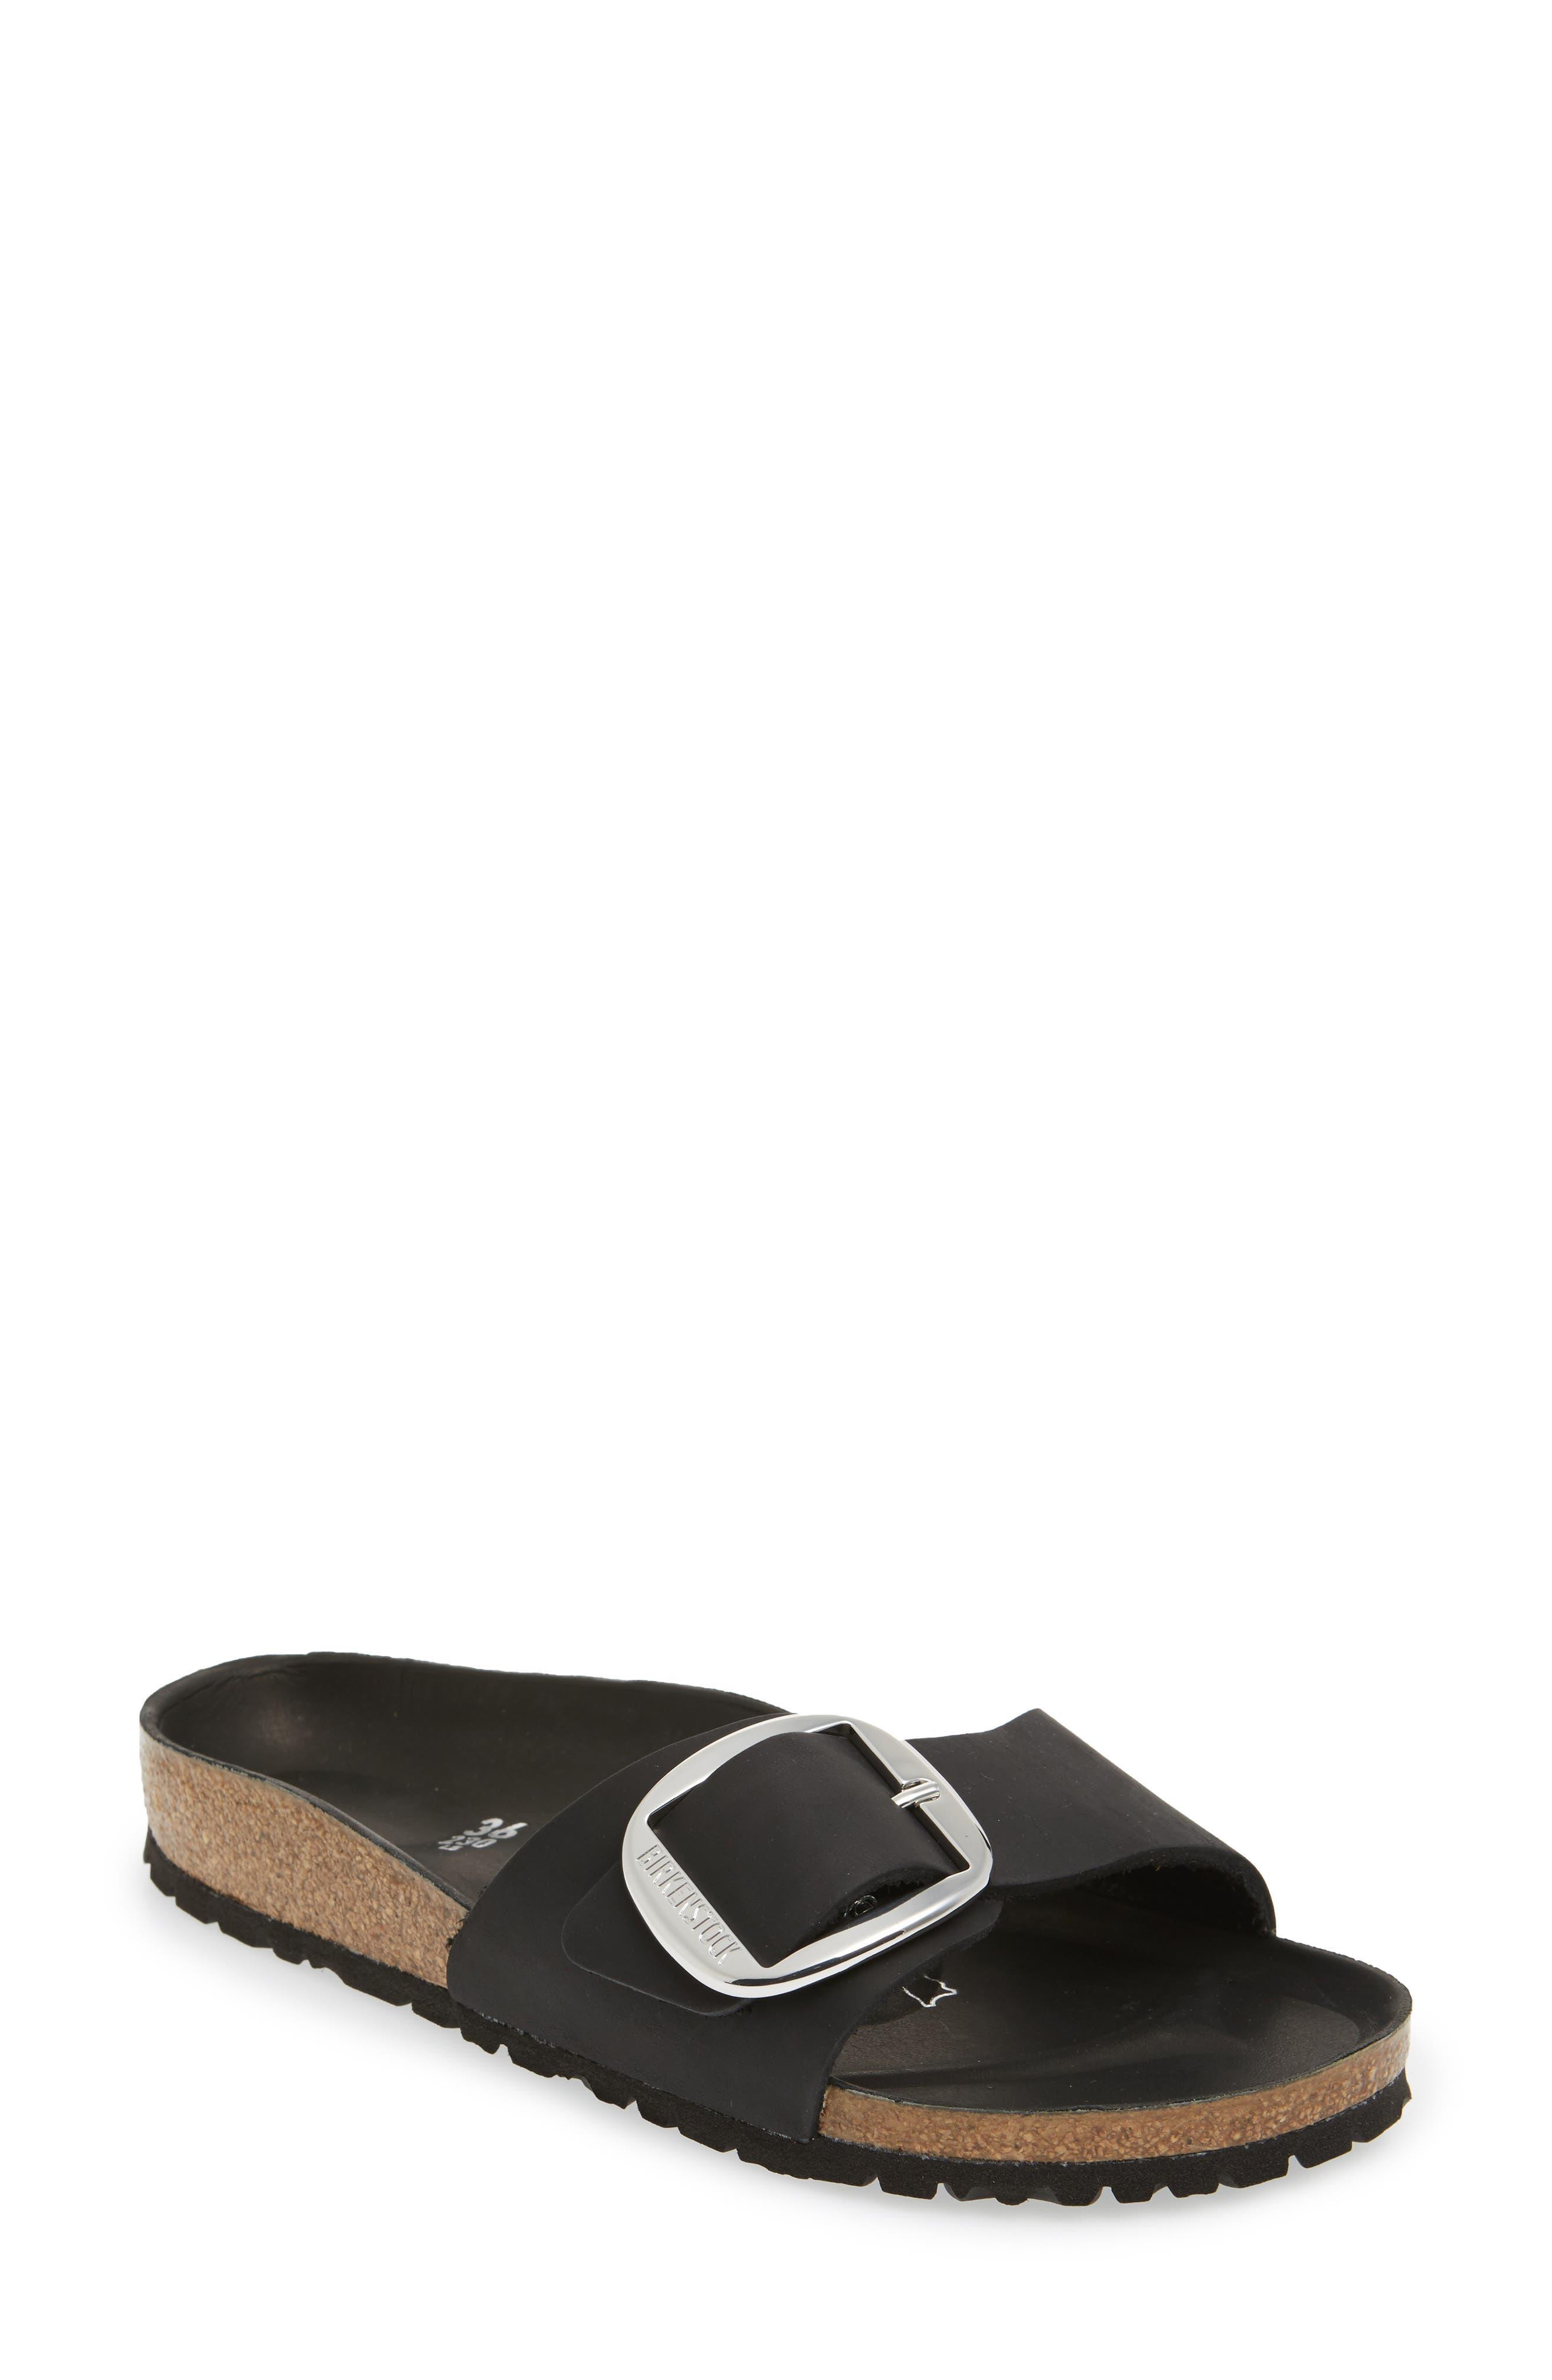 Madrid Big Buckle Slide Sandal,                             Main thumbnail 1, color,                             Black Leather